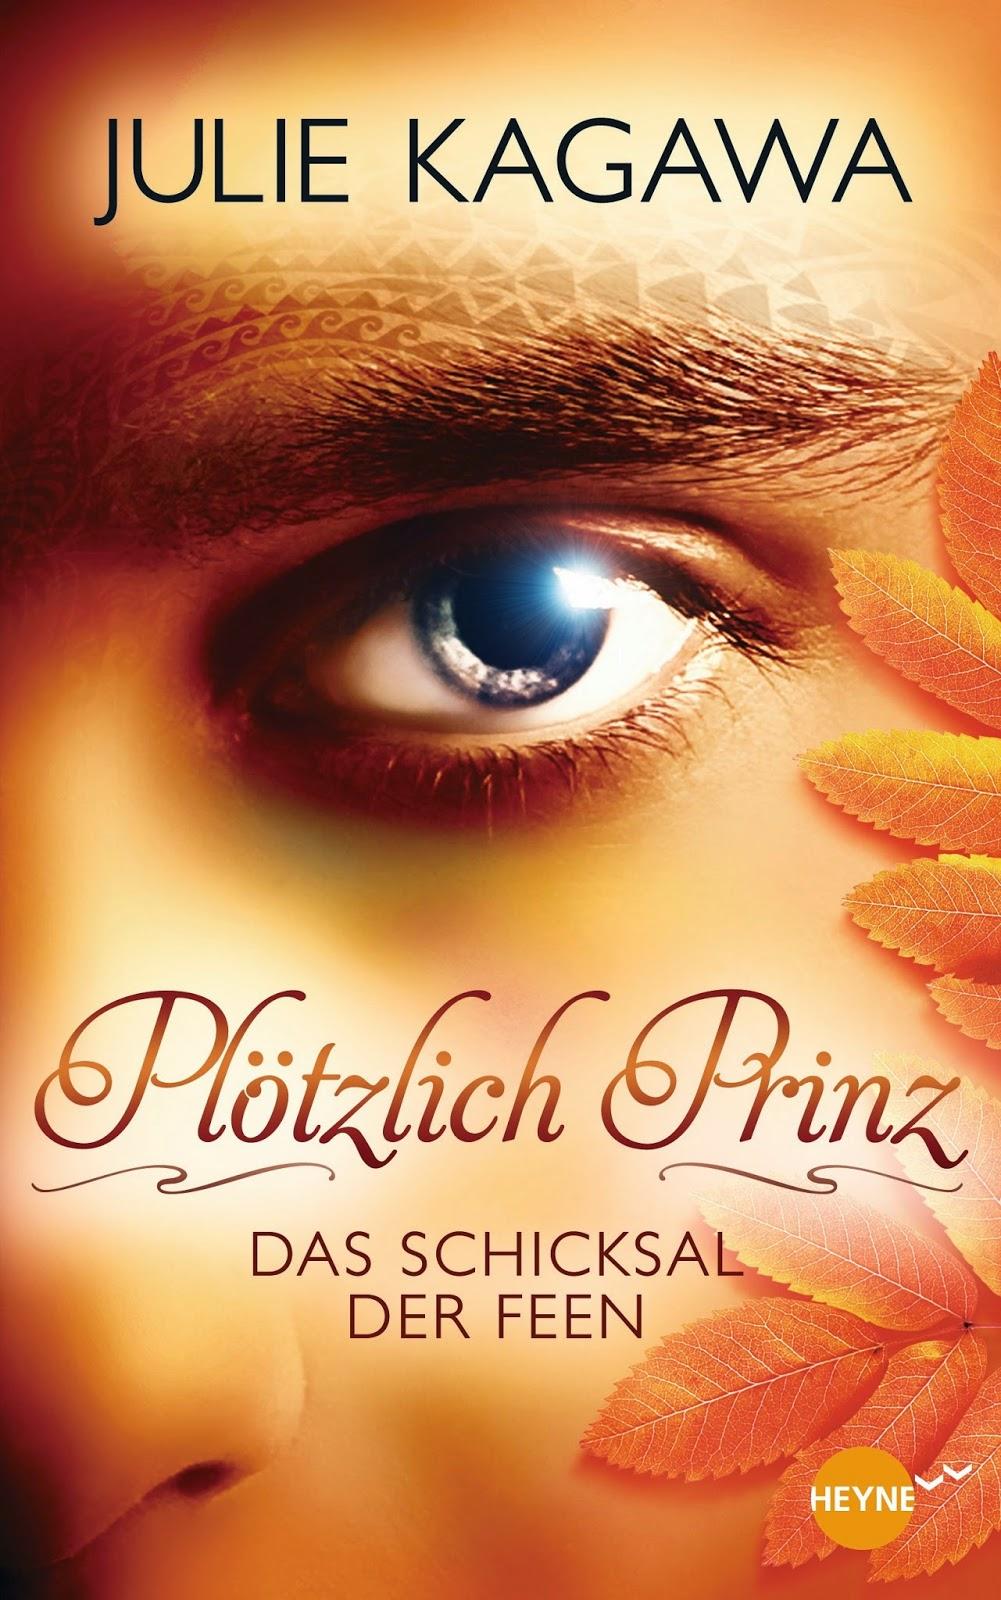 http://www.randomhouse.de/content/edition/covervoila_hires/Kagawa_JPloetzlich_Prinz_2_149408.jpg